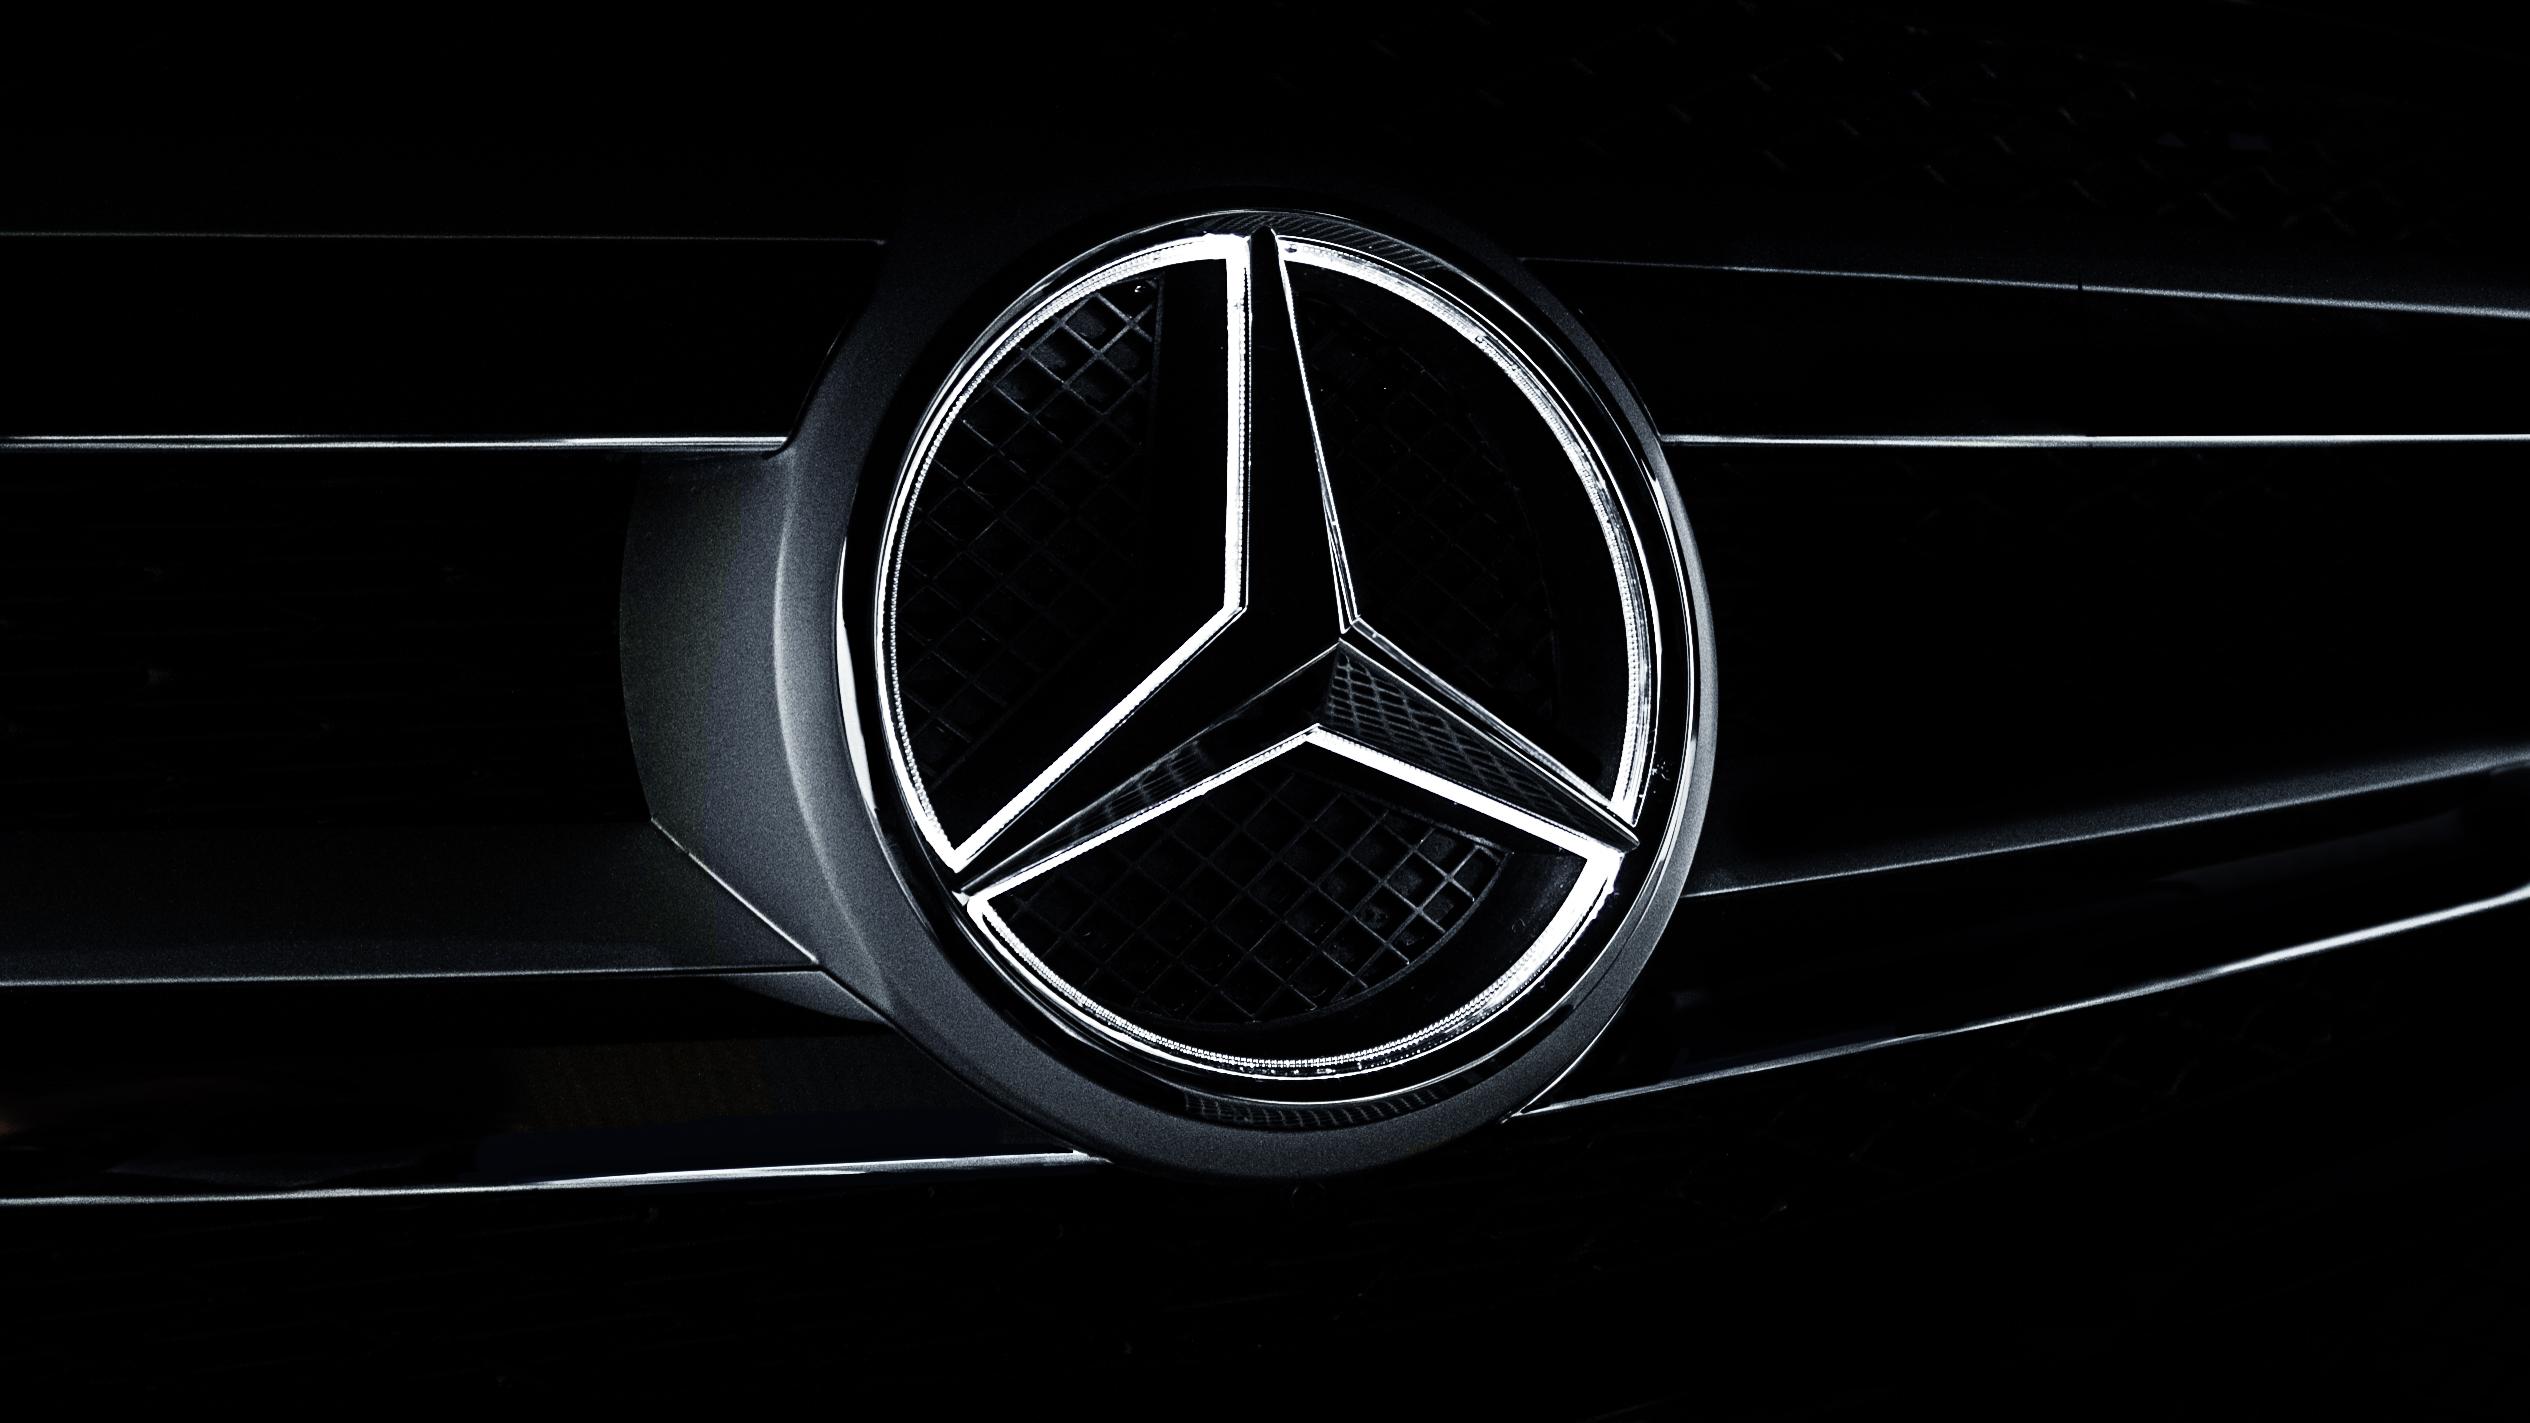 Mercedes-Benz-Logo-Wallpaper - Автопортал Tvoe-avto.com ...